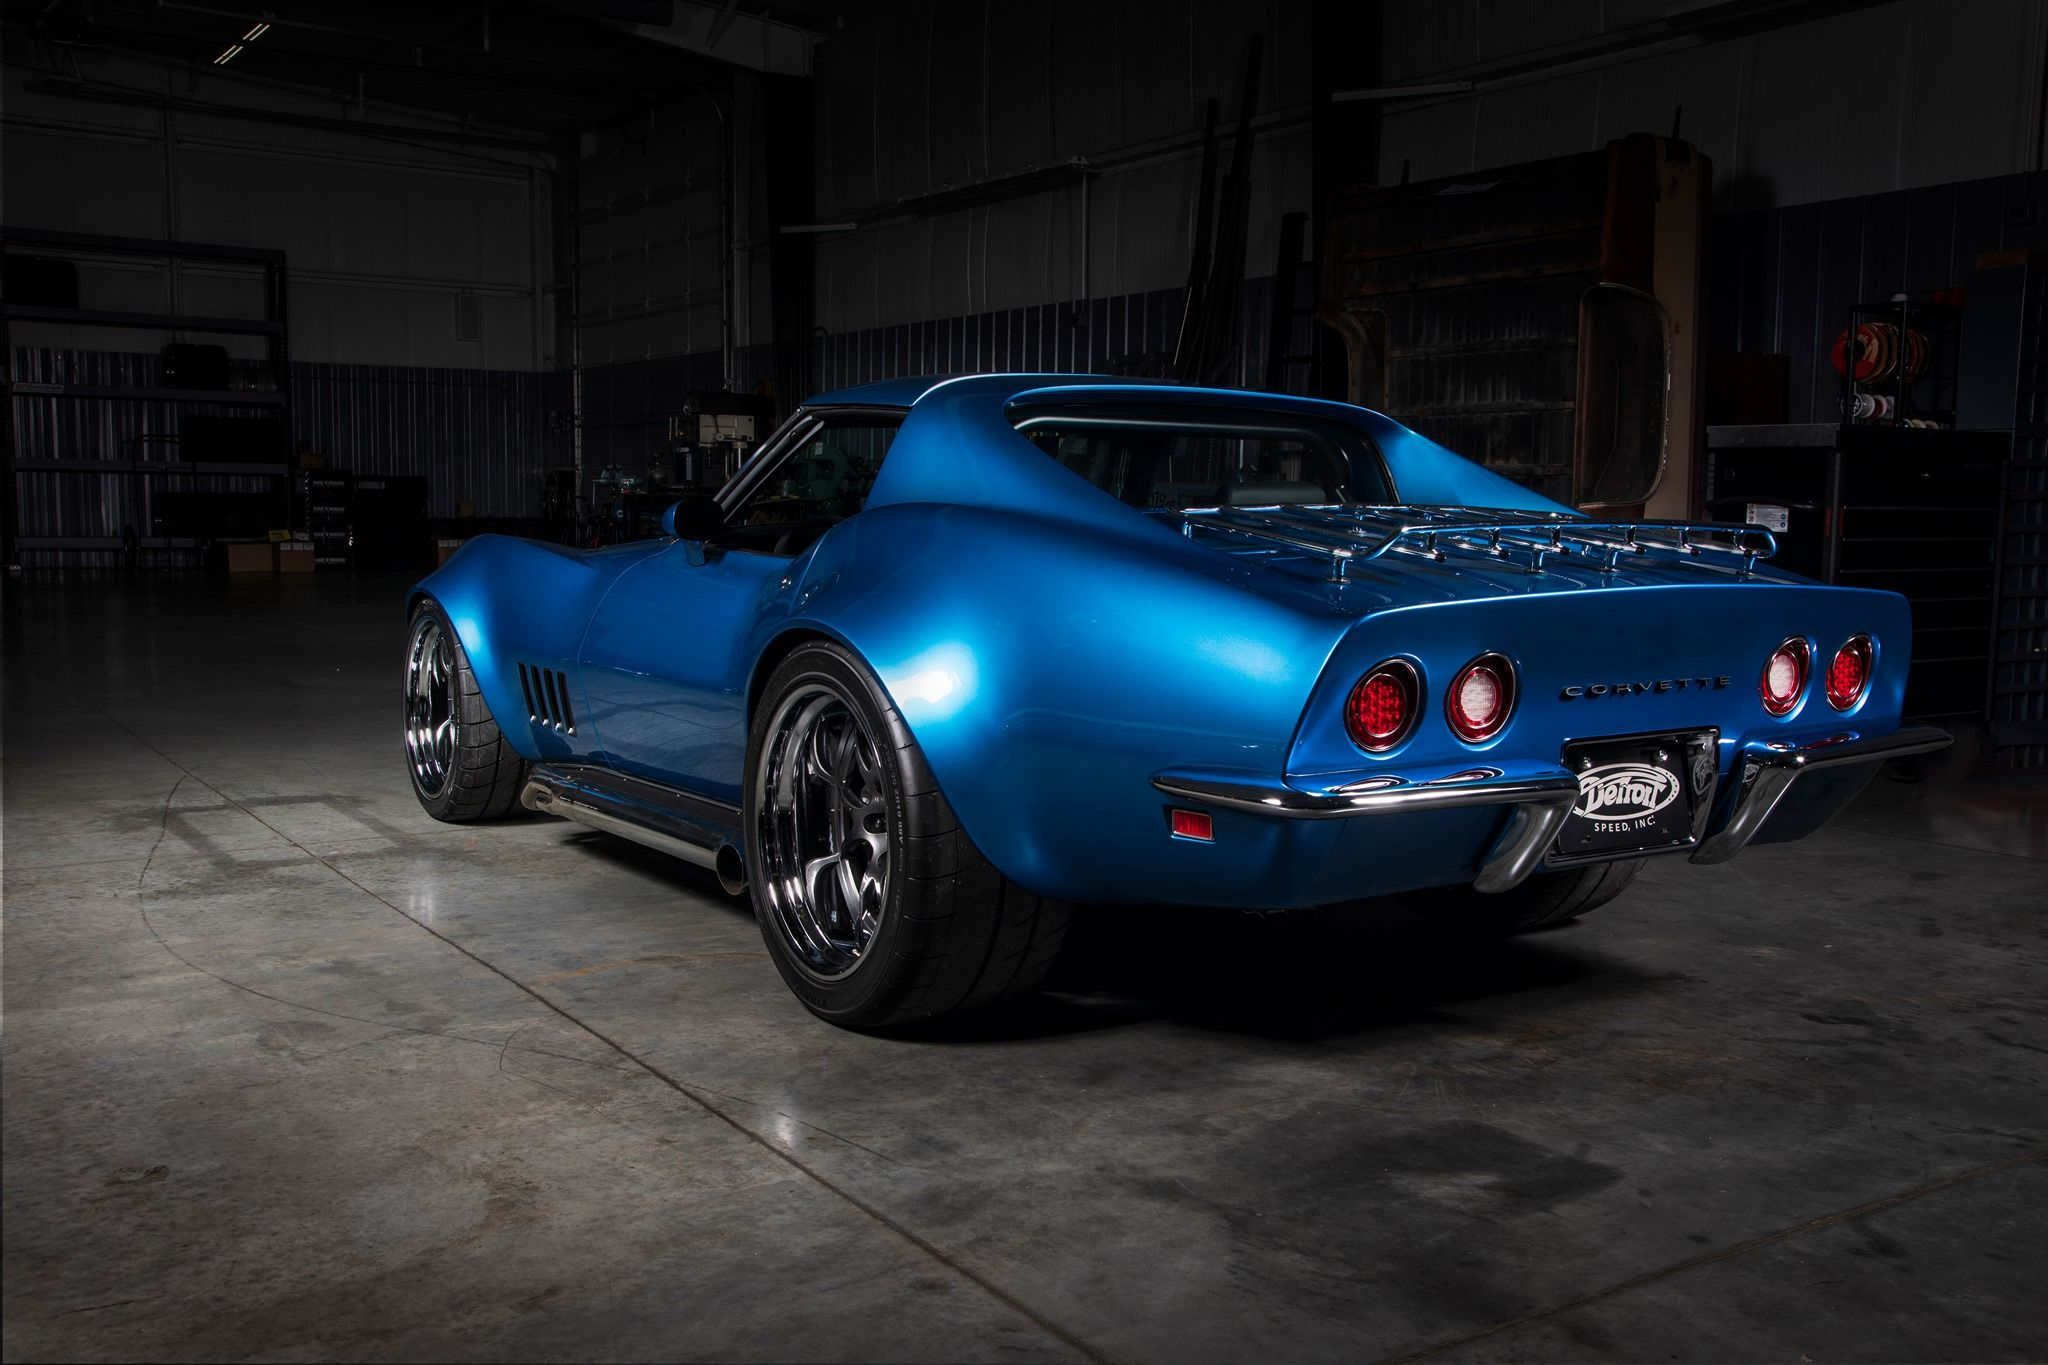 Bob Gawlik's Detroit Speed '69 Corvette on Forgeline GA3R Wheels